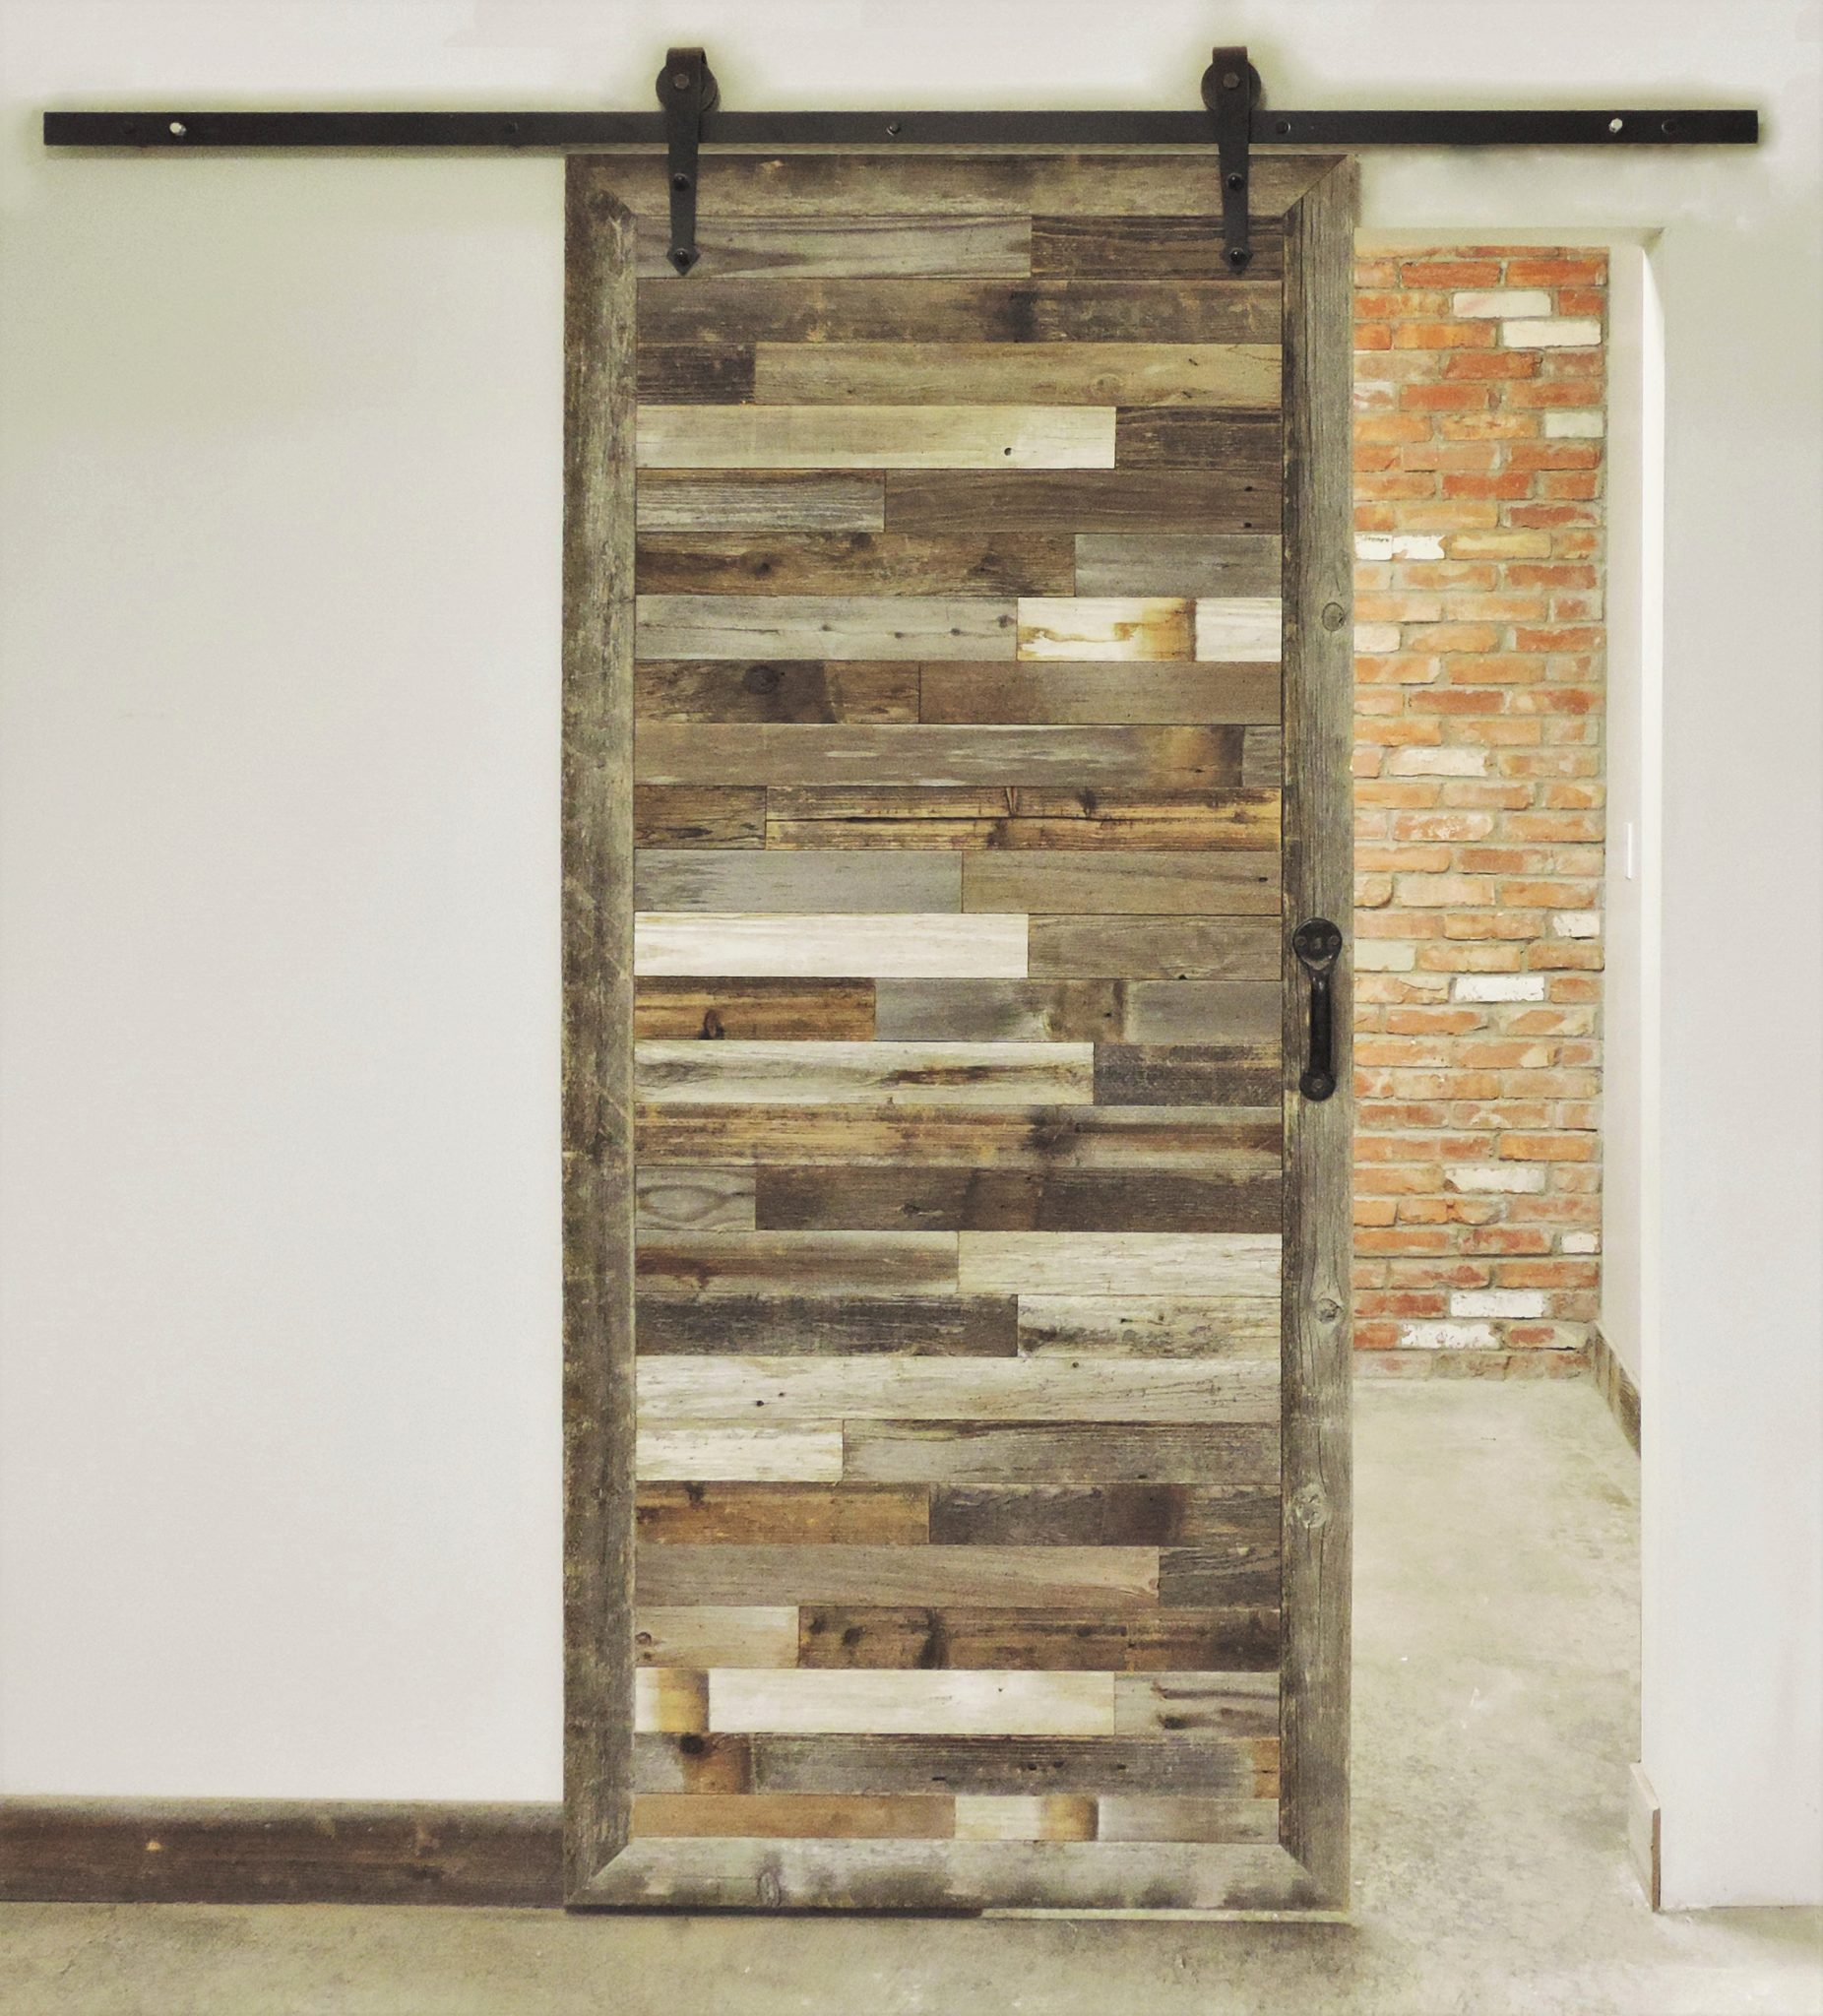 The Inbretton In Style Rustic Reclaimed Wood Sliding Barn Door